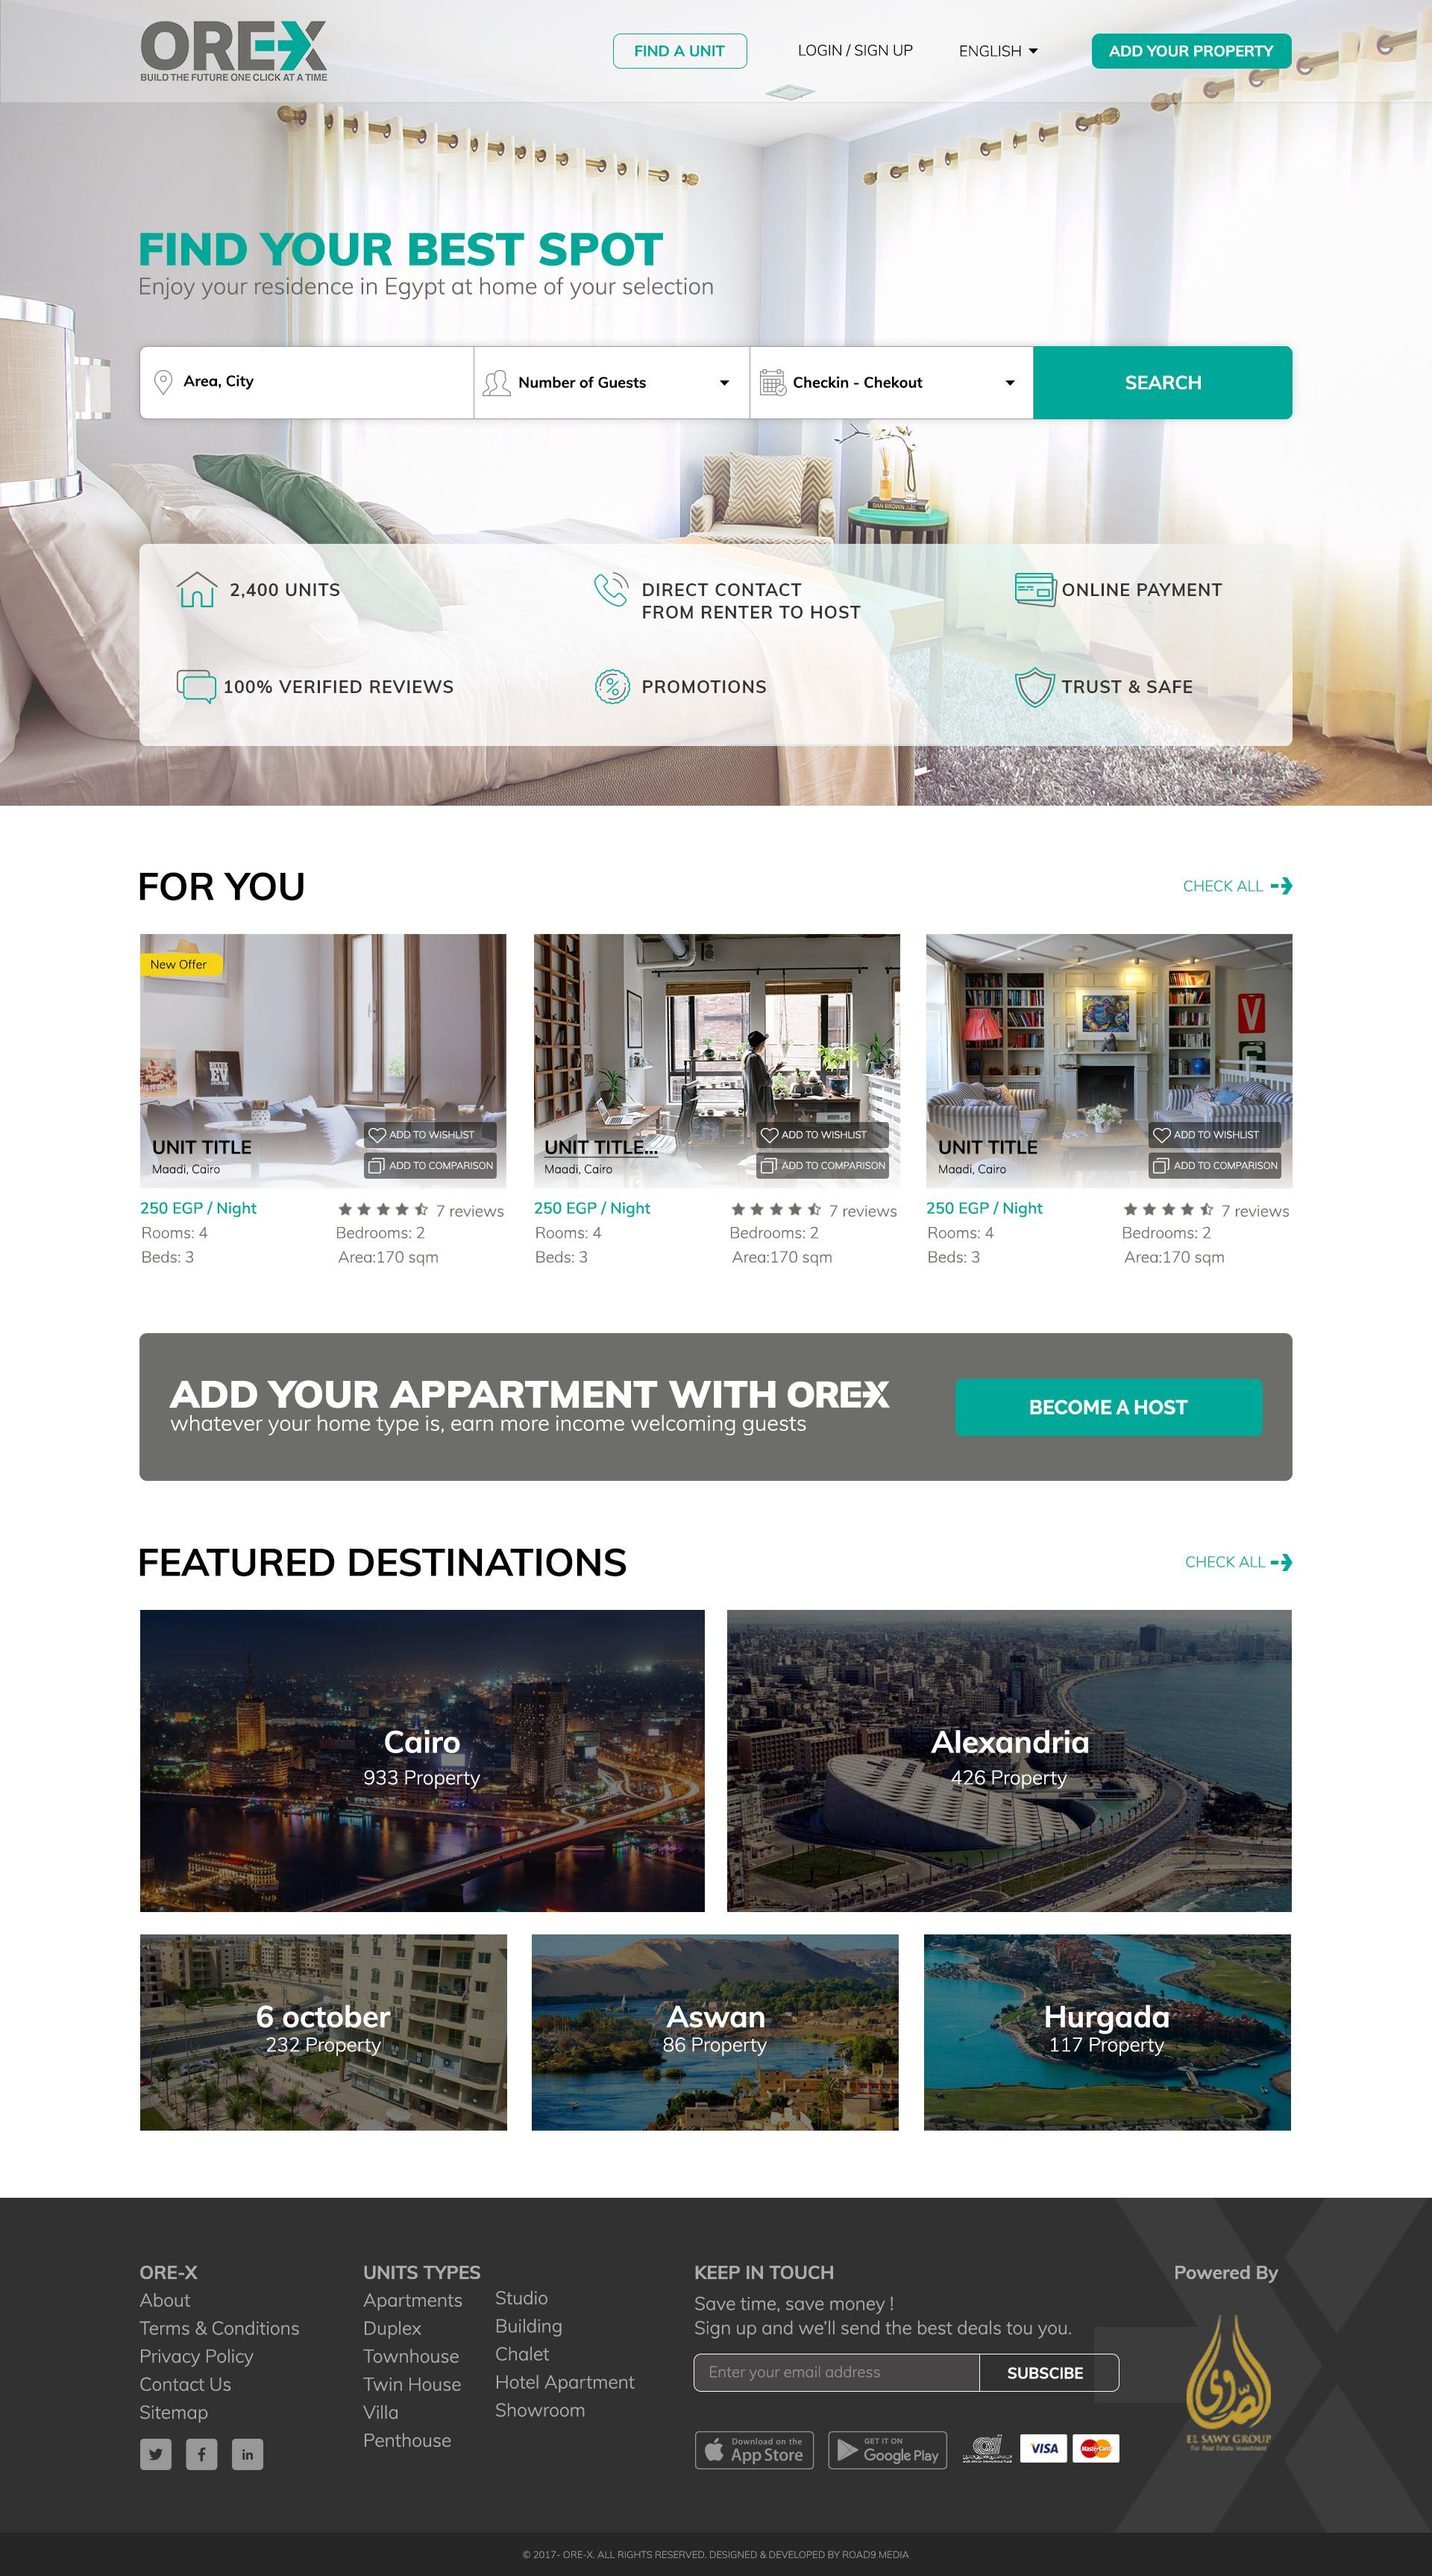 Orex Home Page With Images Web Development Design Design Development